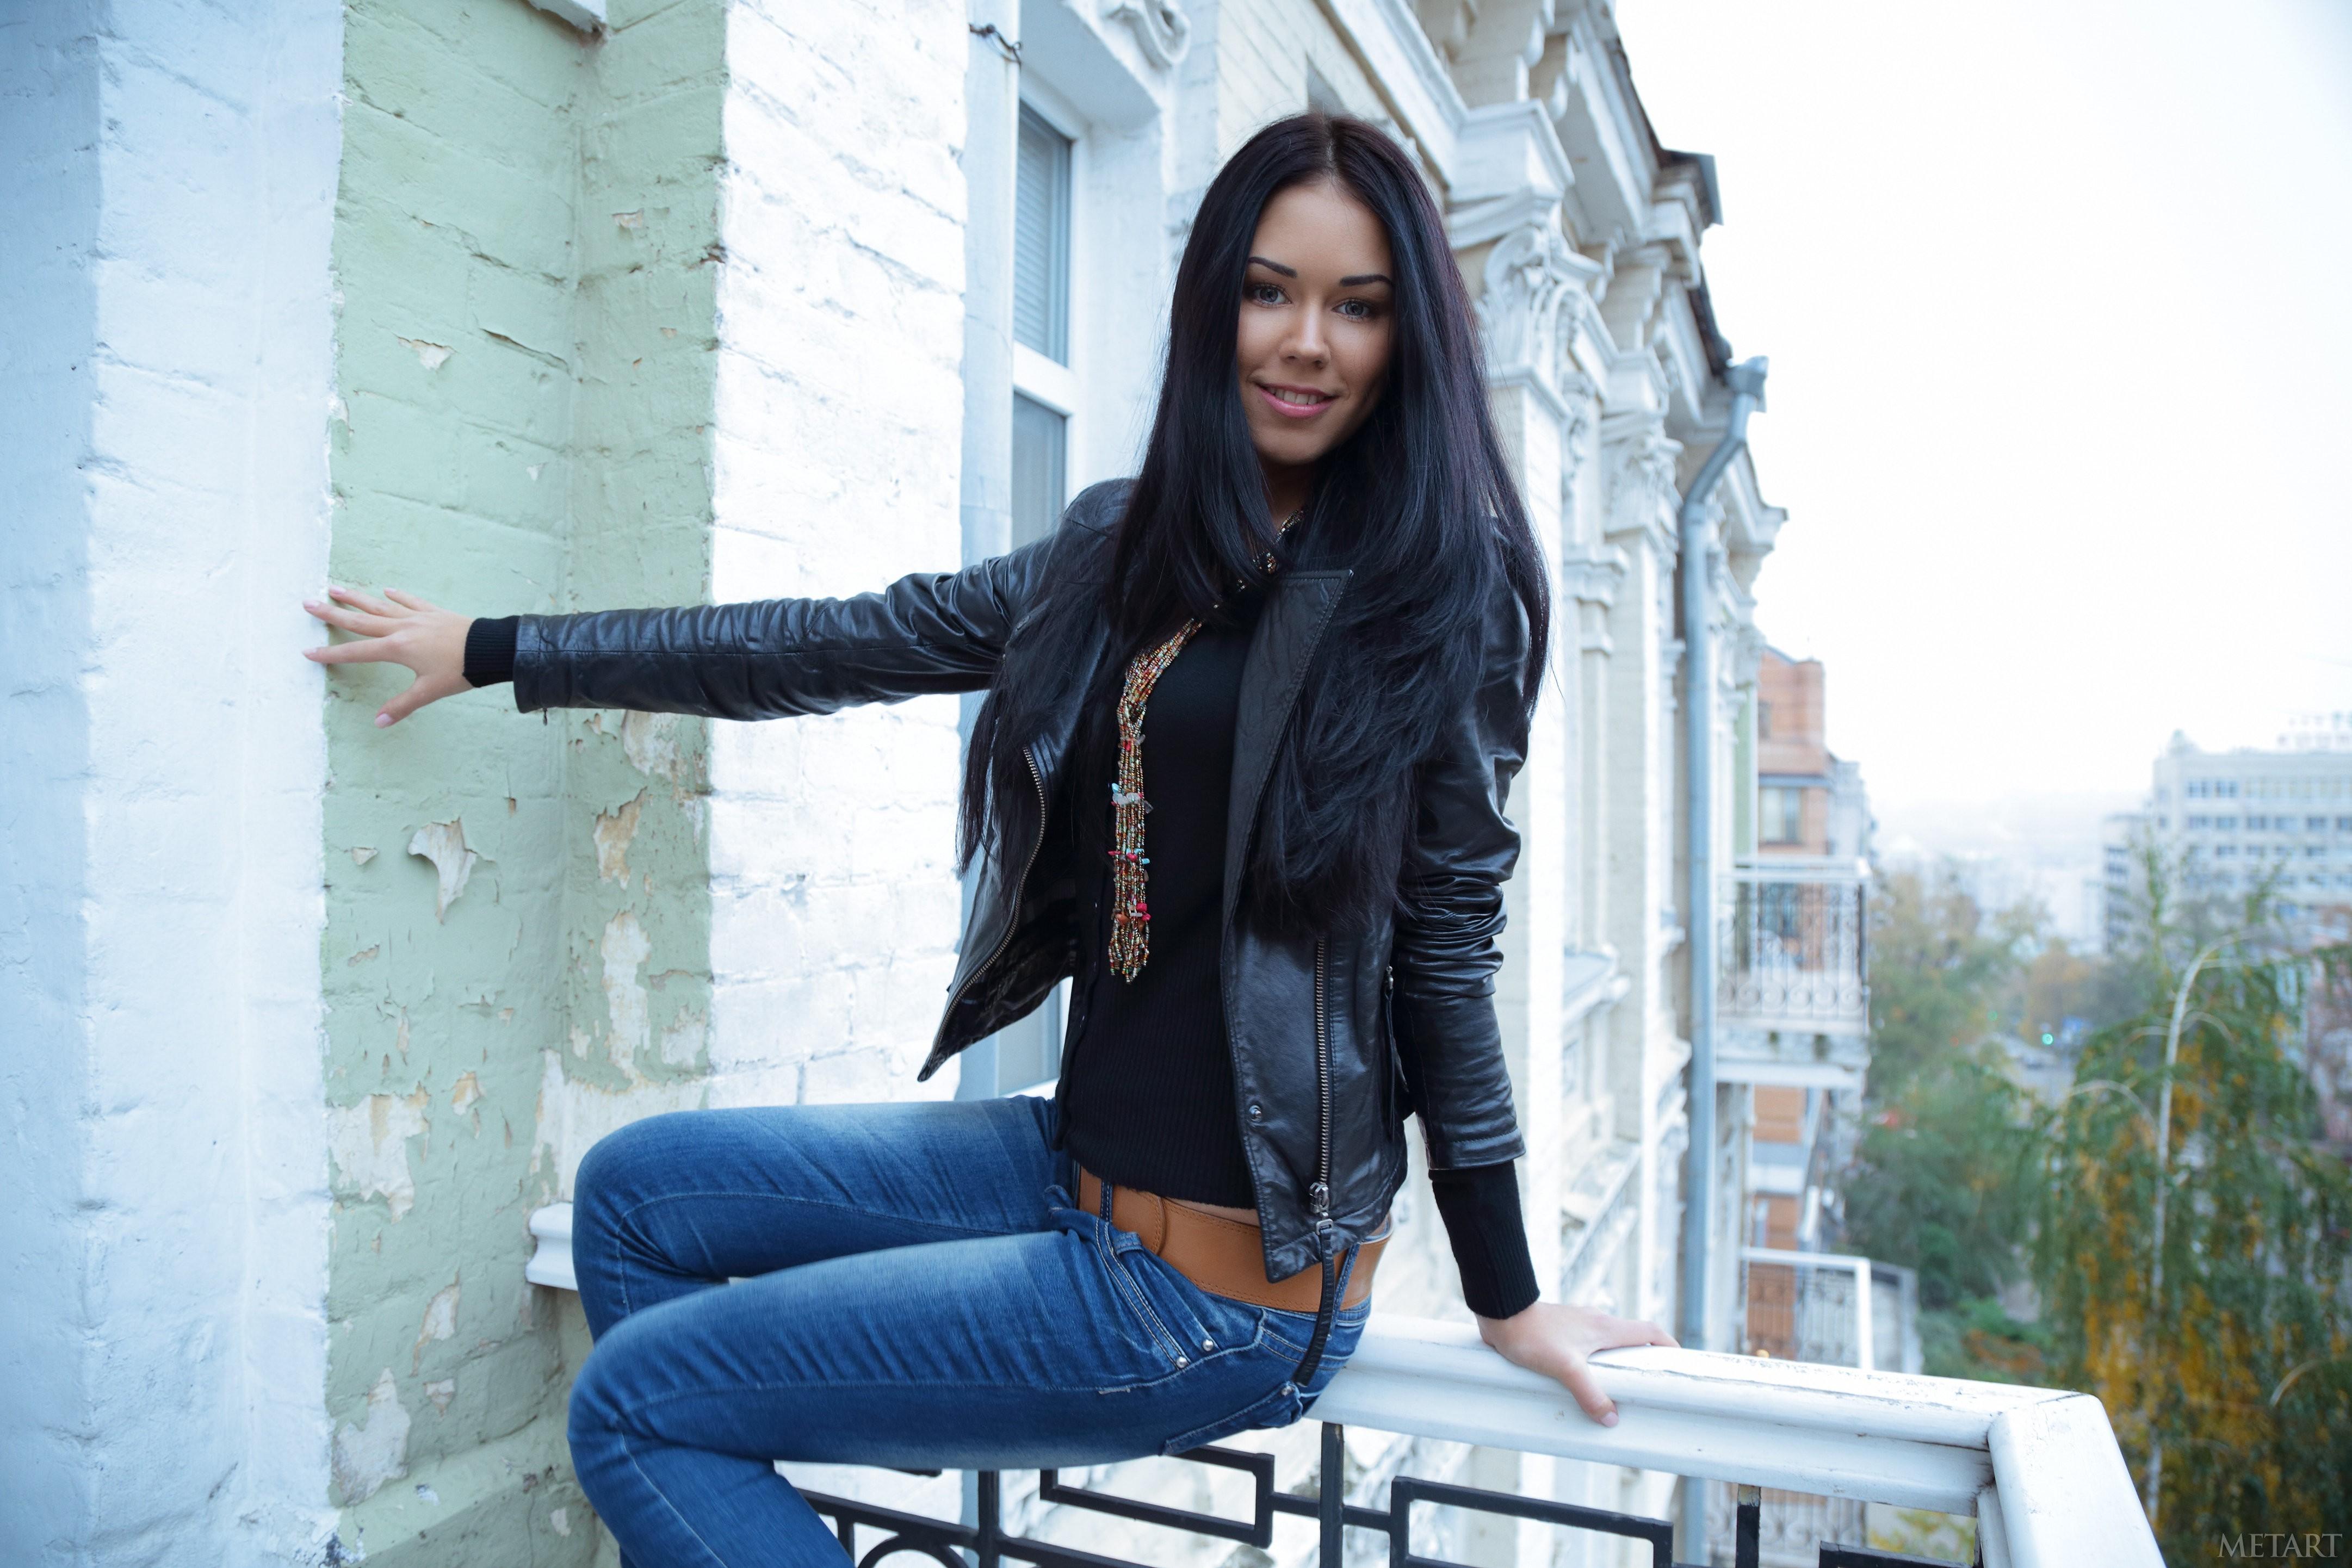 People 4324x2883 women model dark hair long hair Macy B smiling women outdoors balcony jeans leather jackets black hair MetArt Magazine